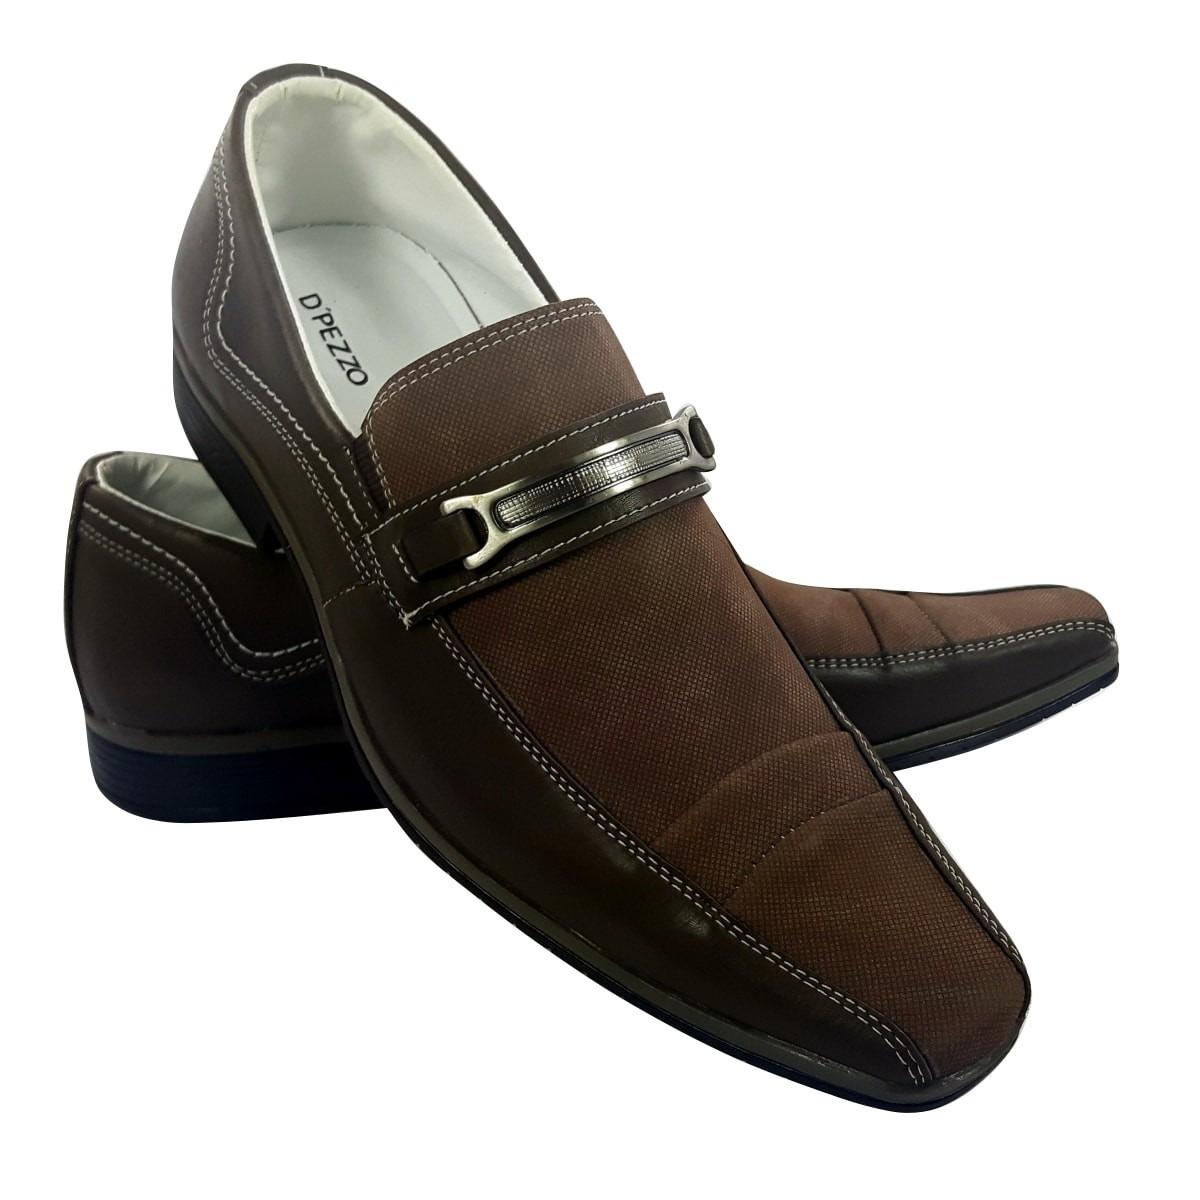 c2de046d0 Sapato Masculino Social Elegante Couro E Tecido - R  65